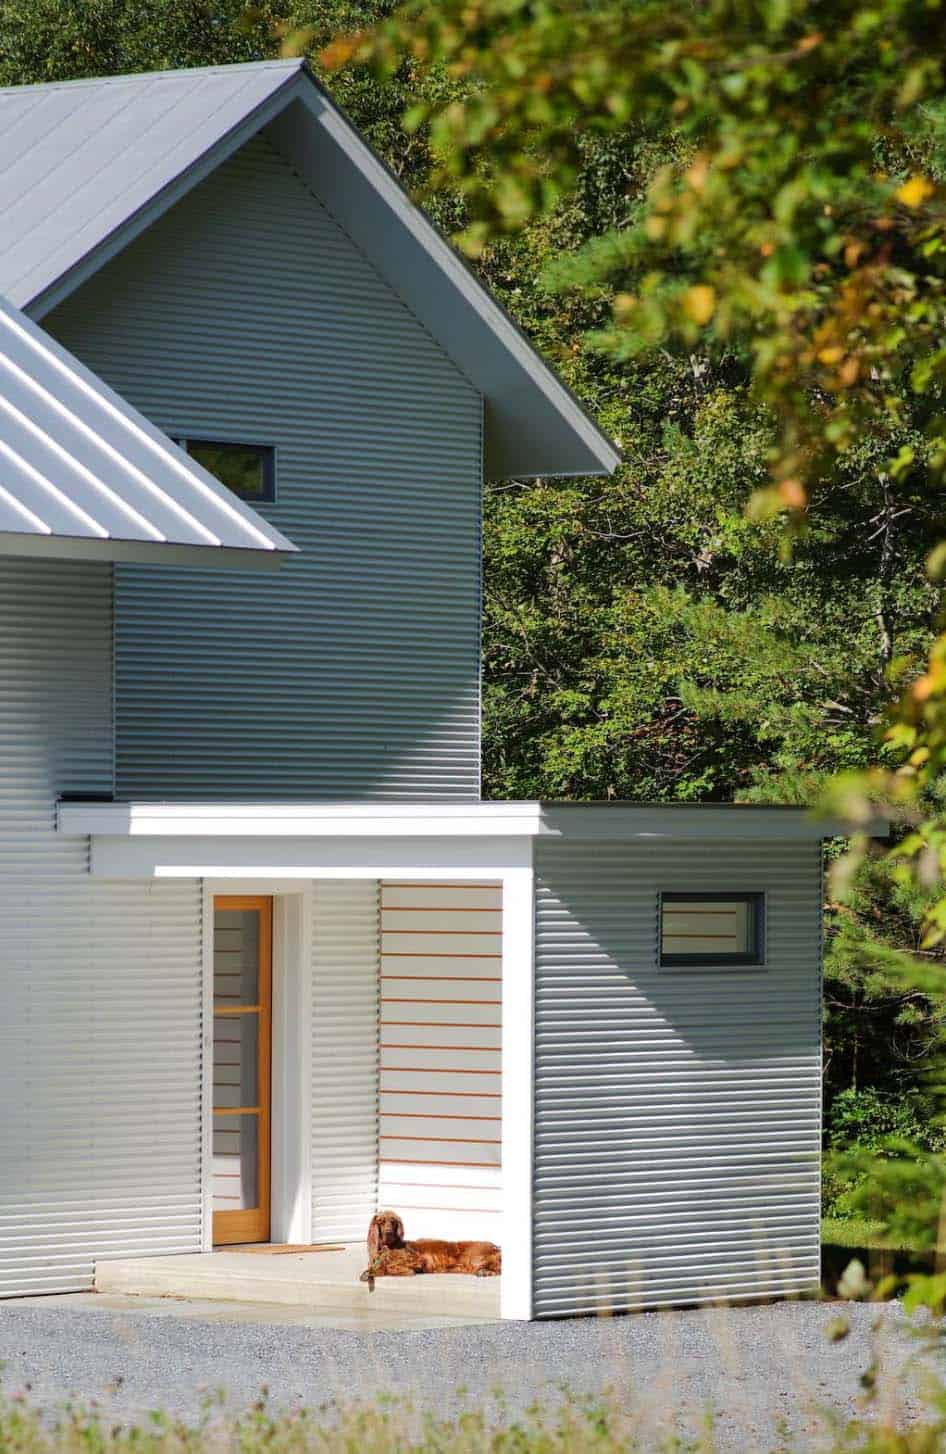 Modern Farm House-TruexCullins Architecture-01-1 Kindesign